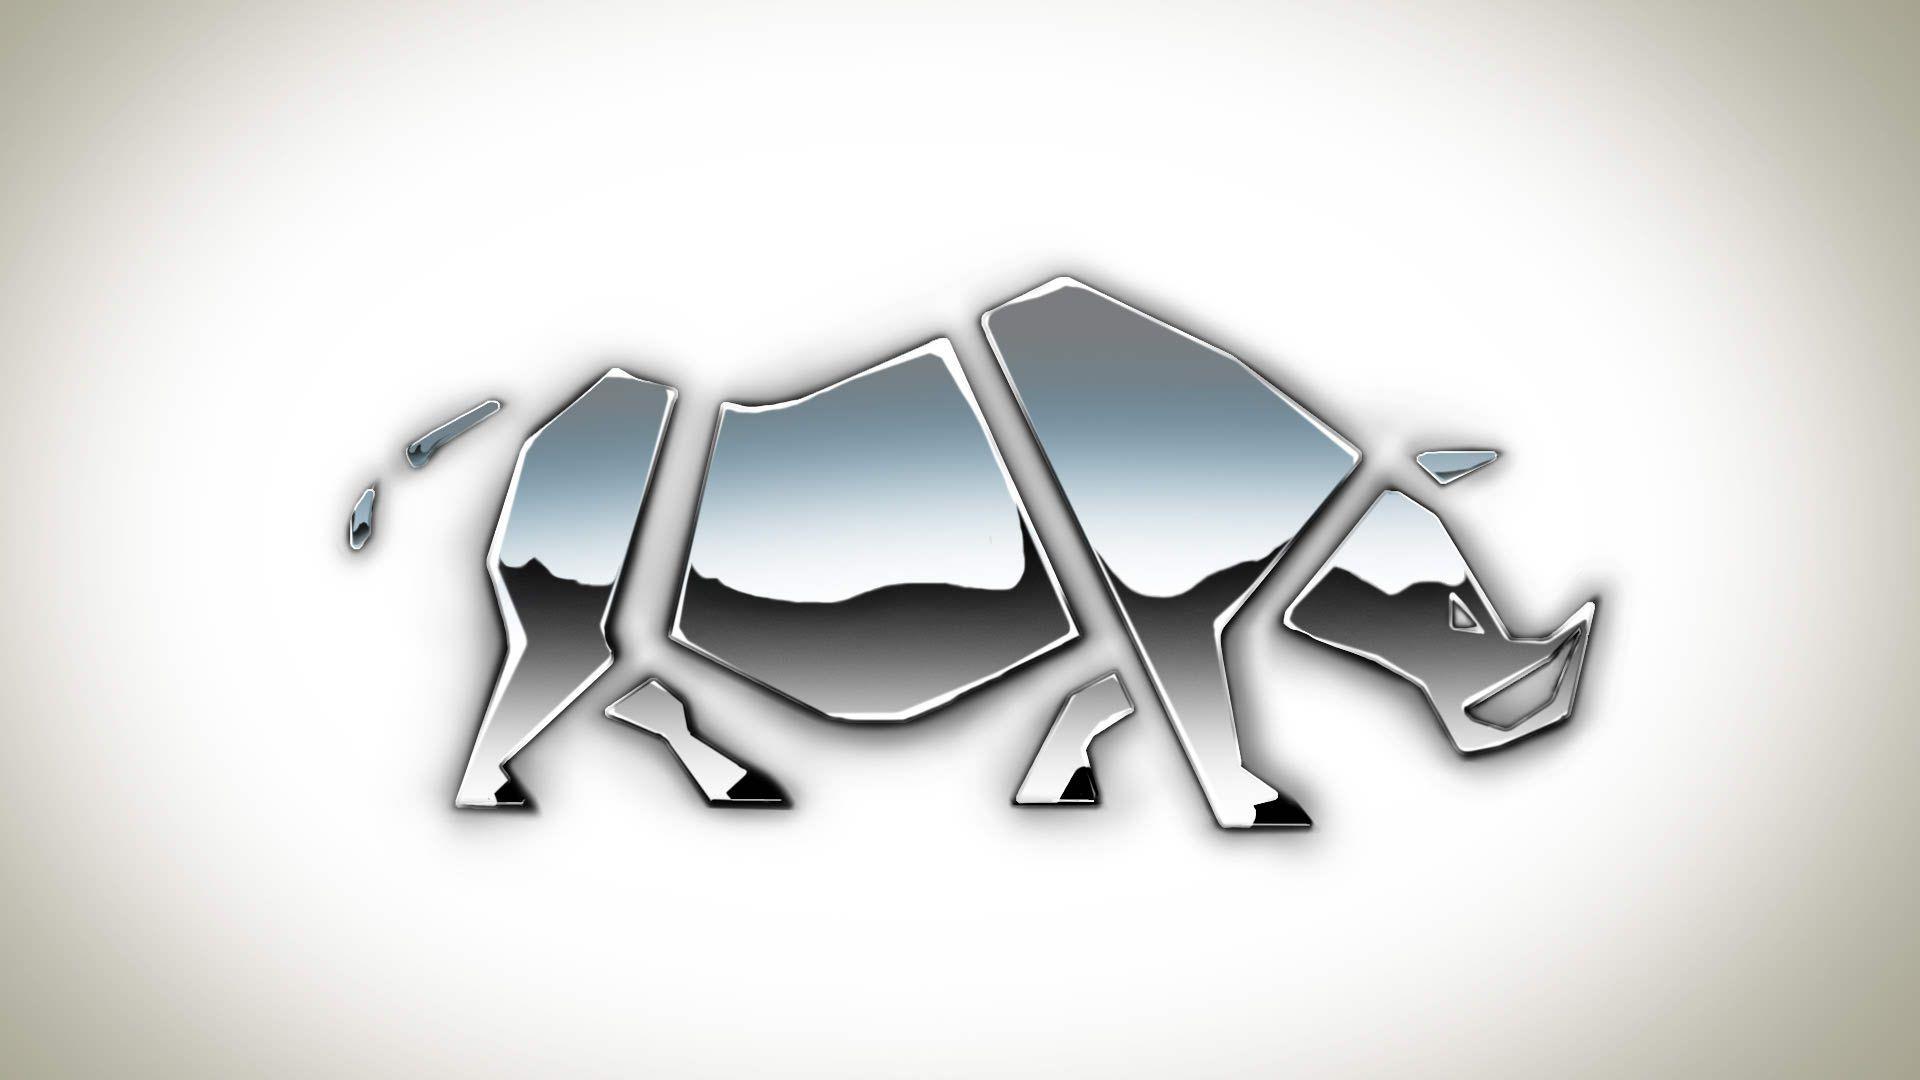 rhino hd wallpapers   animals hd wallpapers   pinterest   hd